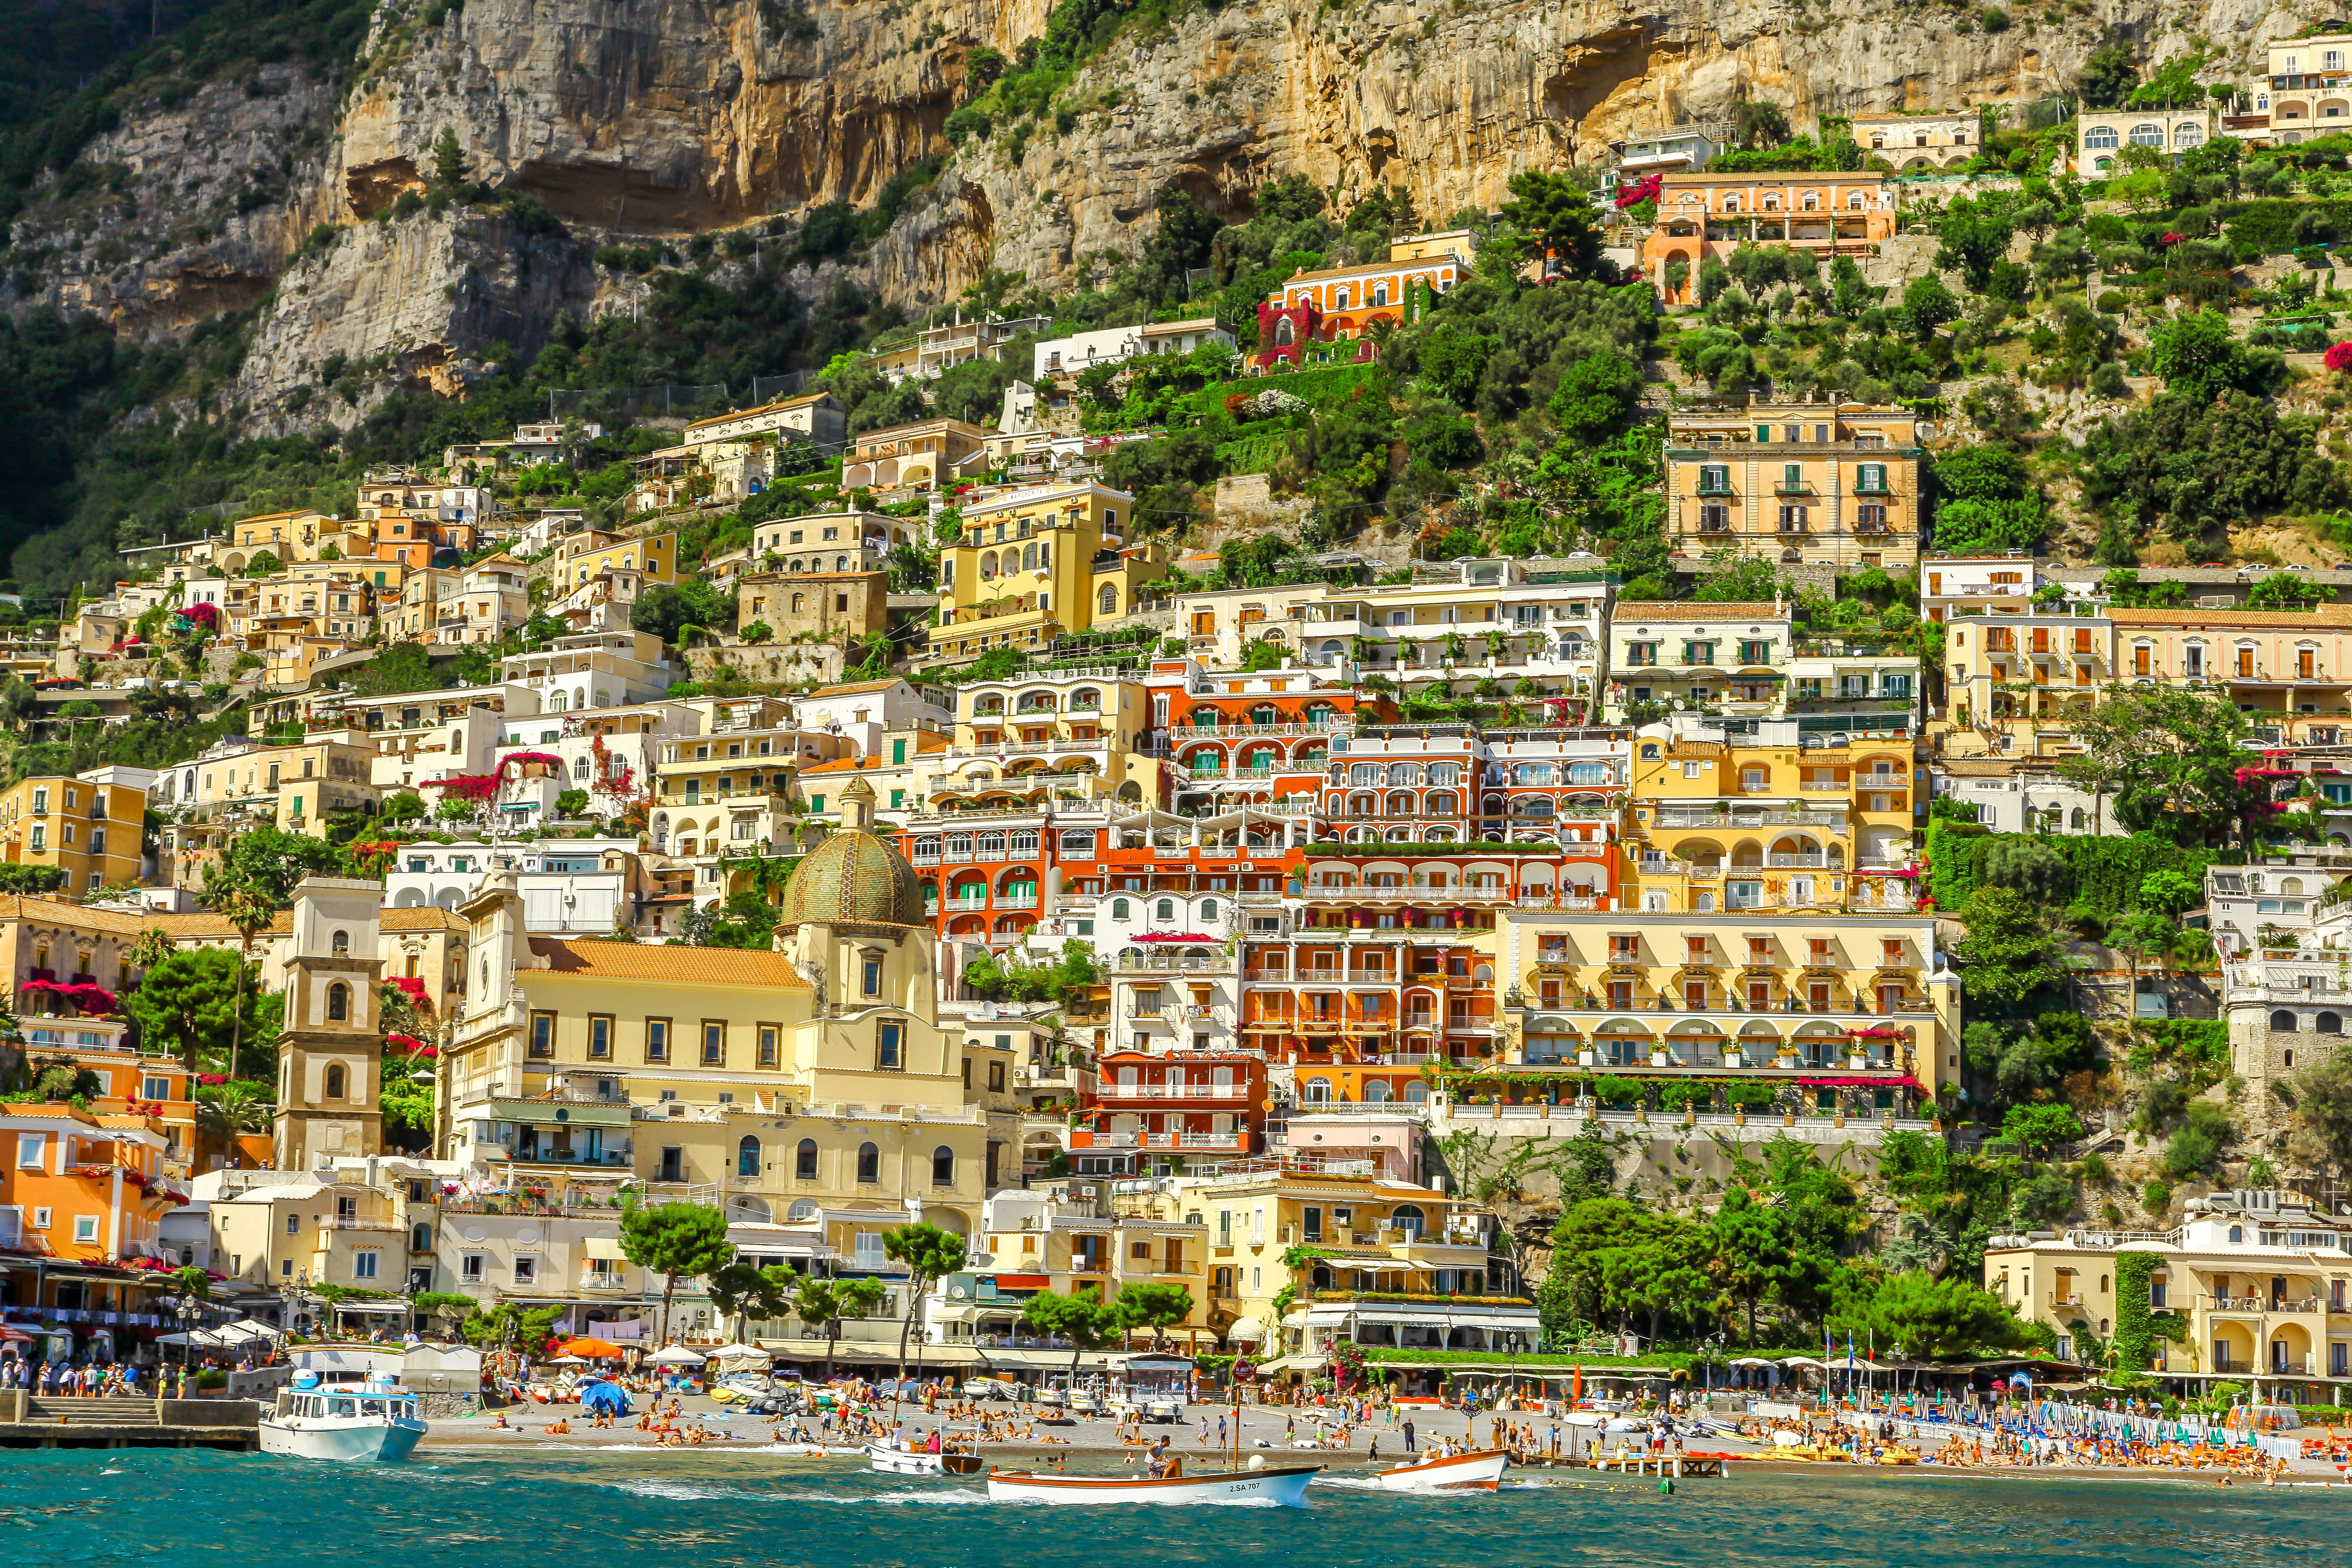 amalfi coast buildings